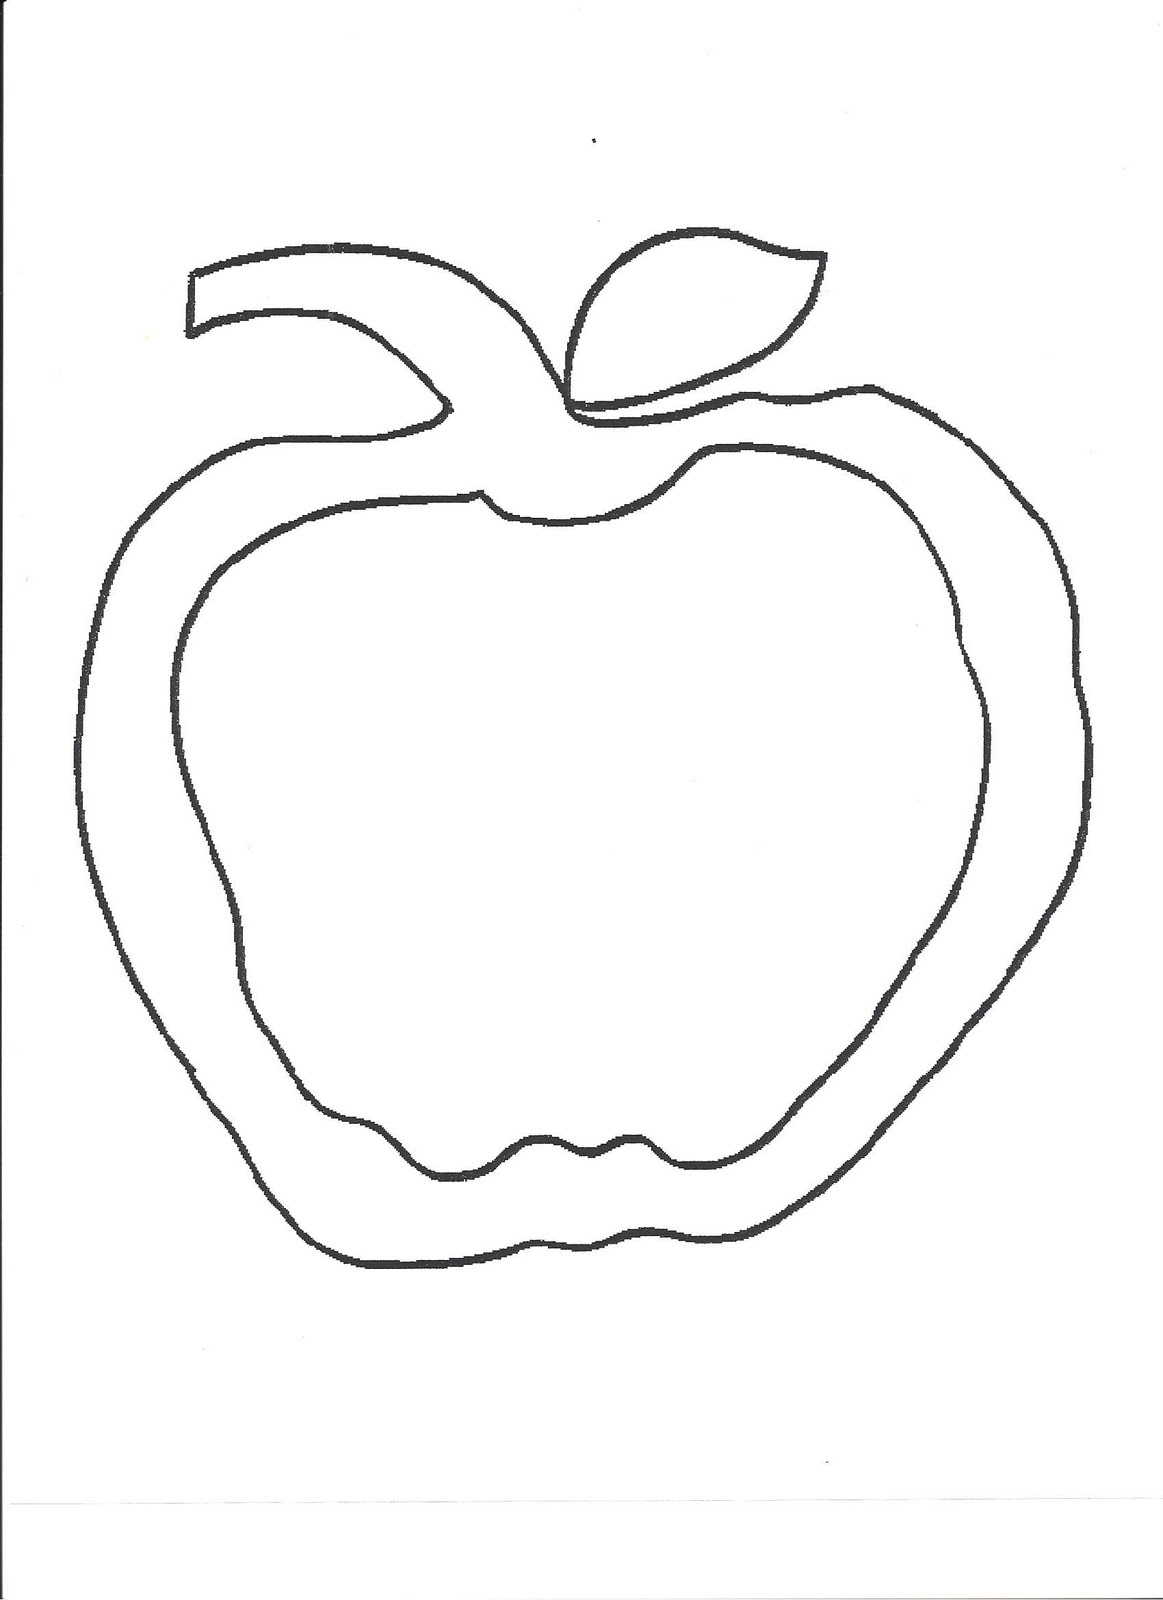 Crafts For Preschoolers: Templates